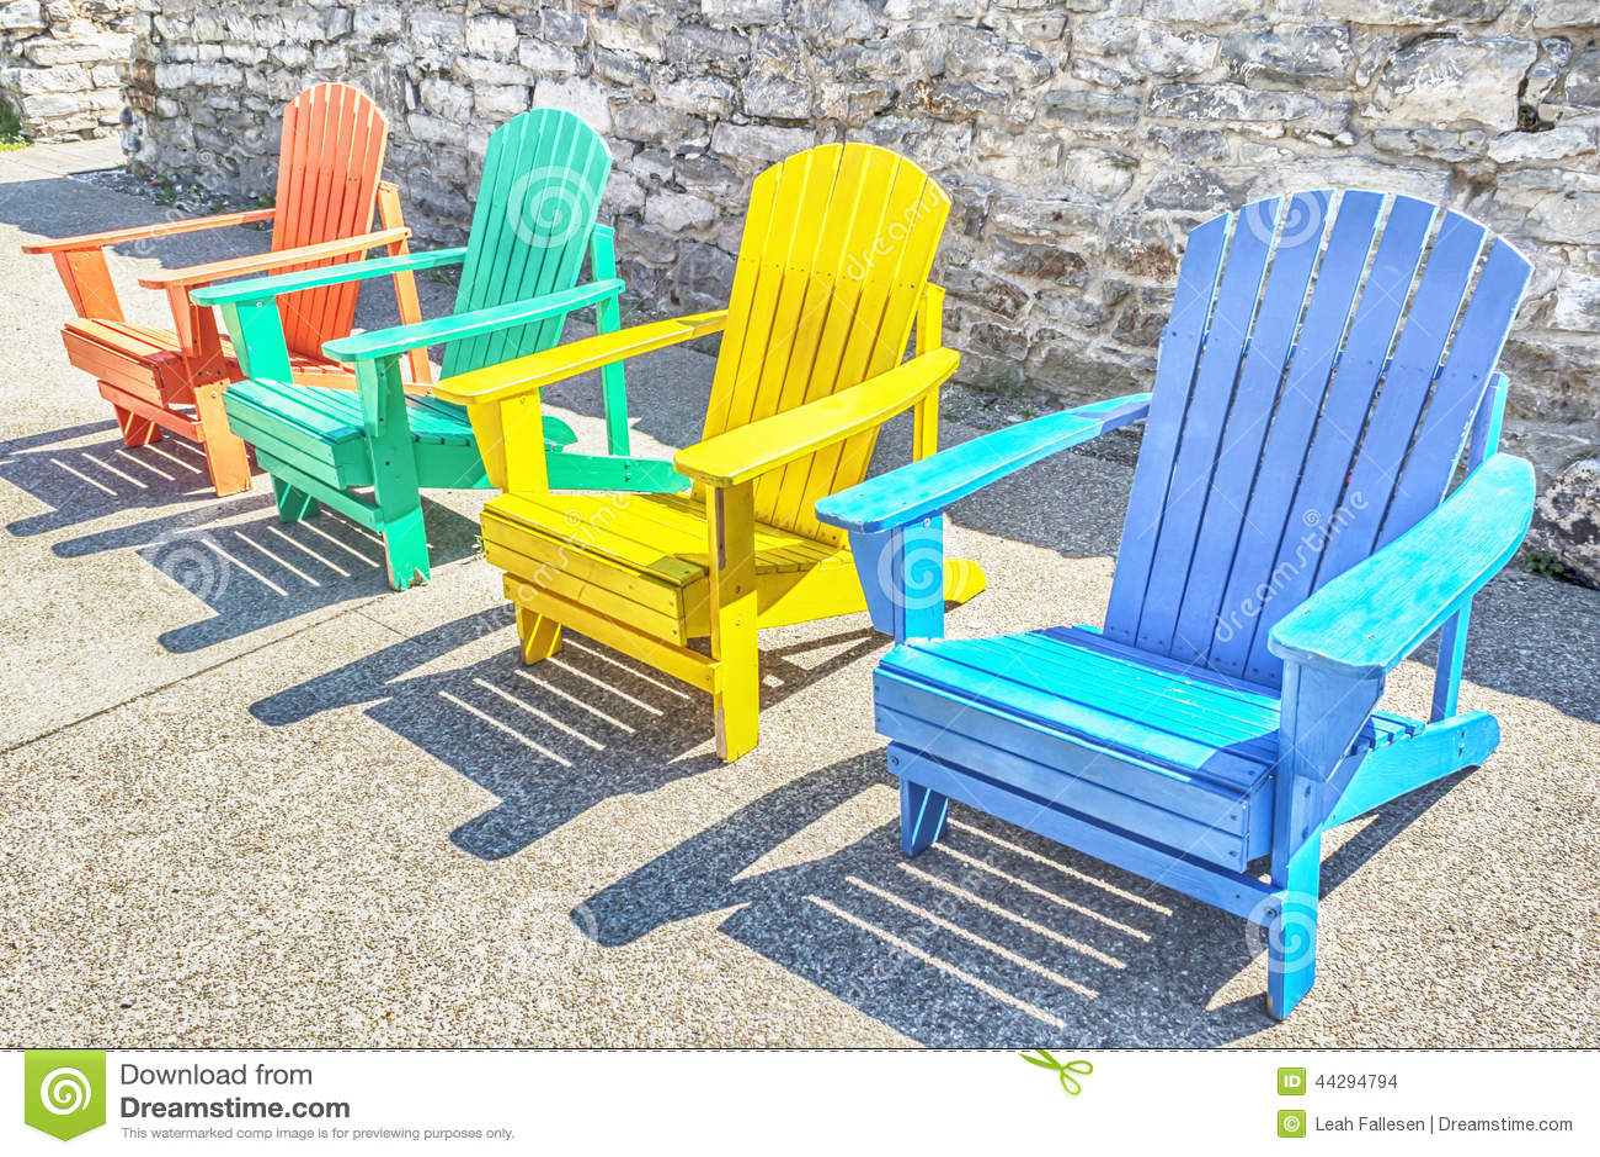 Colorful adirondack chairs - Colorful Adirondack Chairs Stock Photo